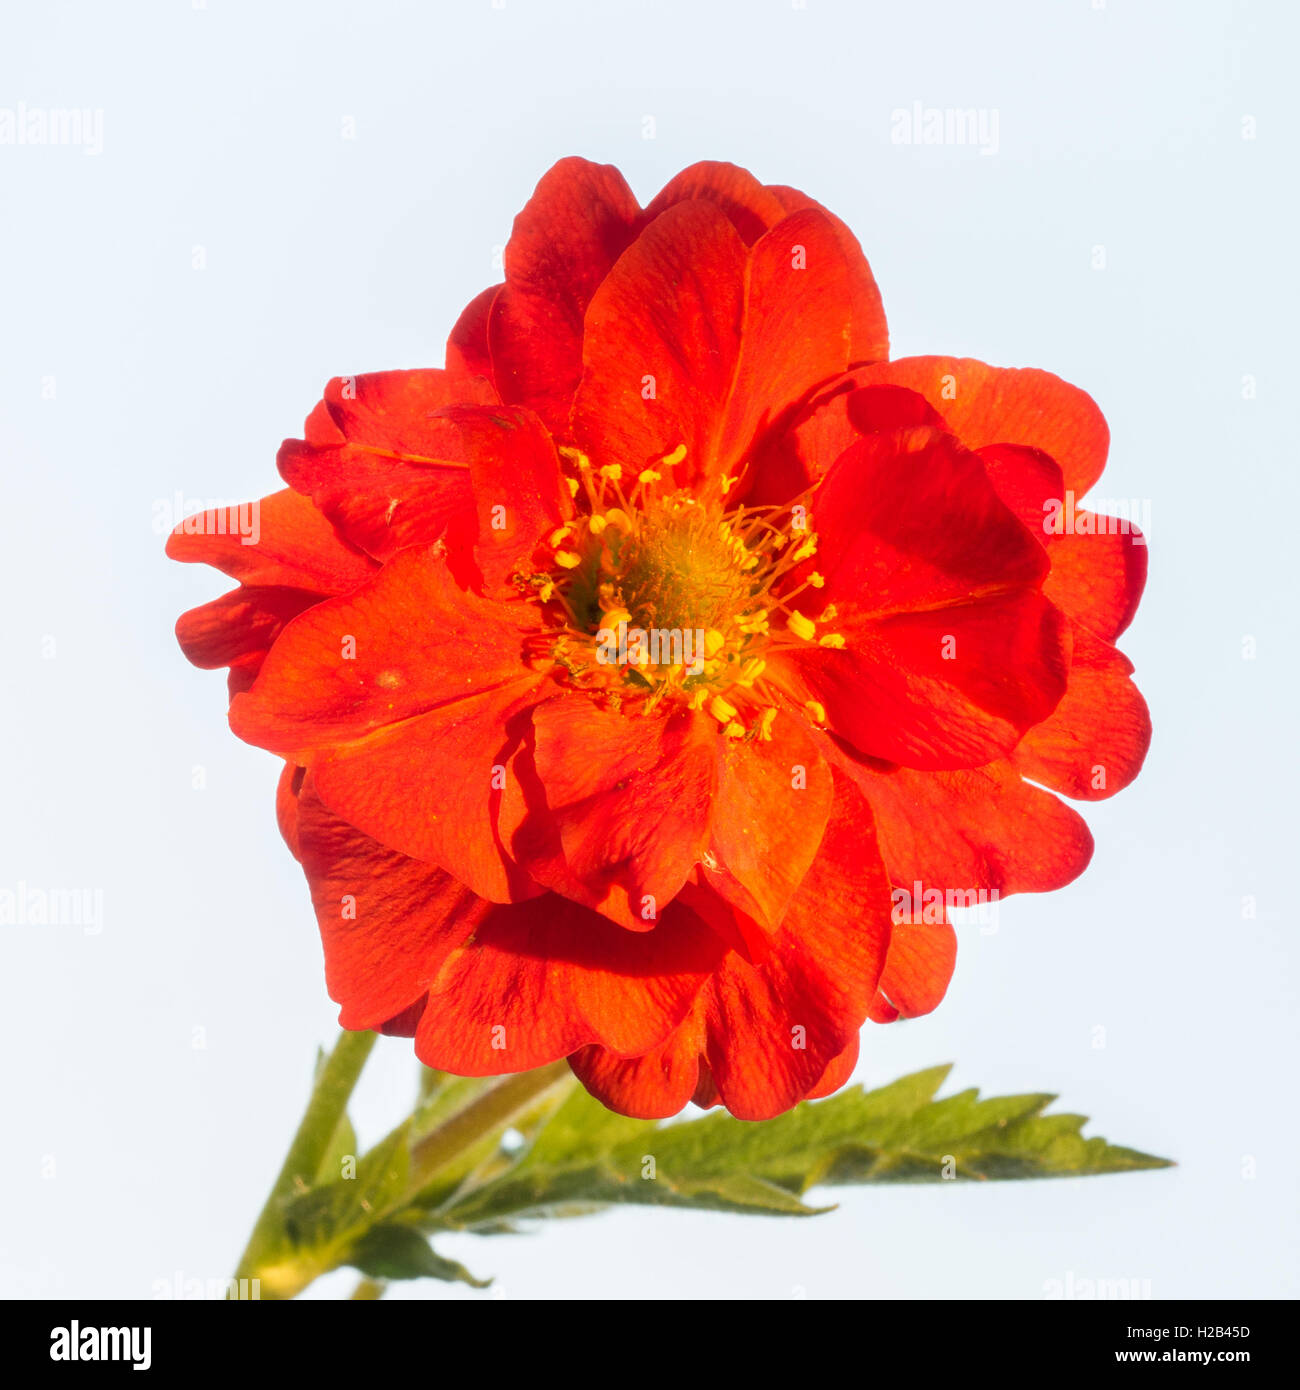 Geum 'Blazing Sunset' flower - Stock Image